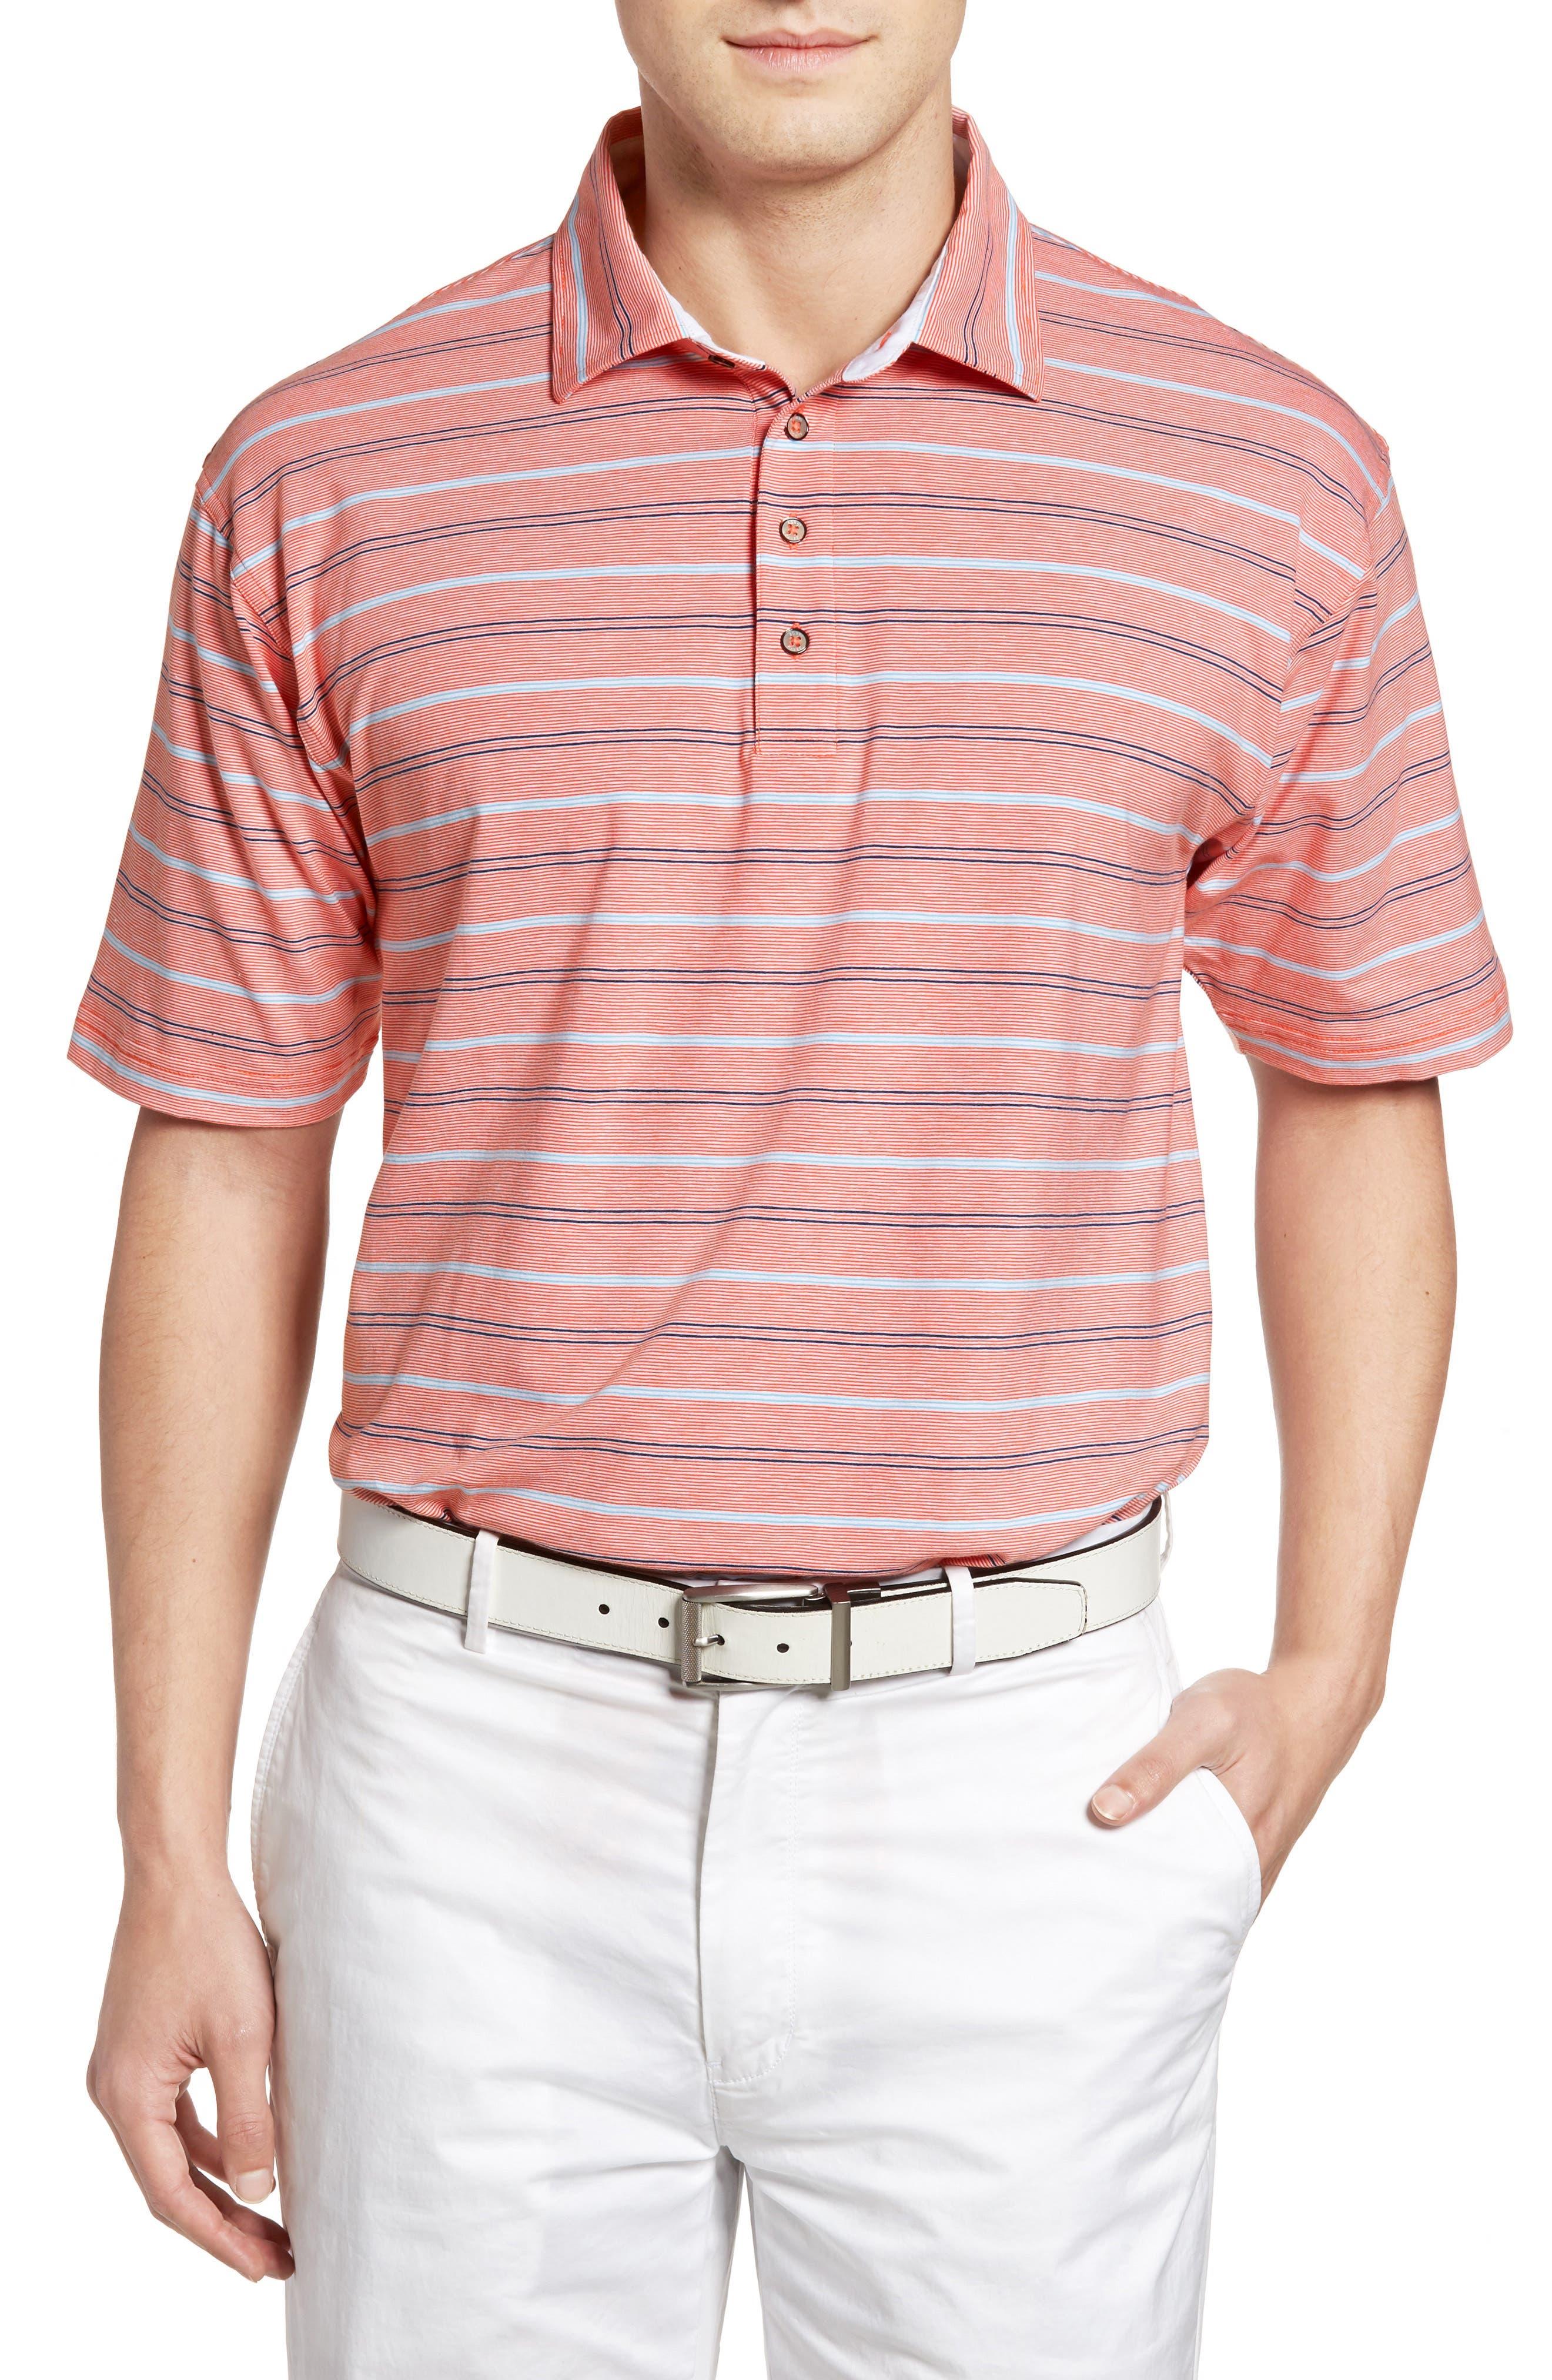 Bobby Jones Liquid Cotton Stripe Jersey Golf Polo